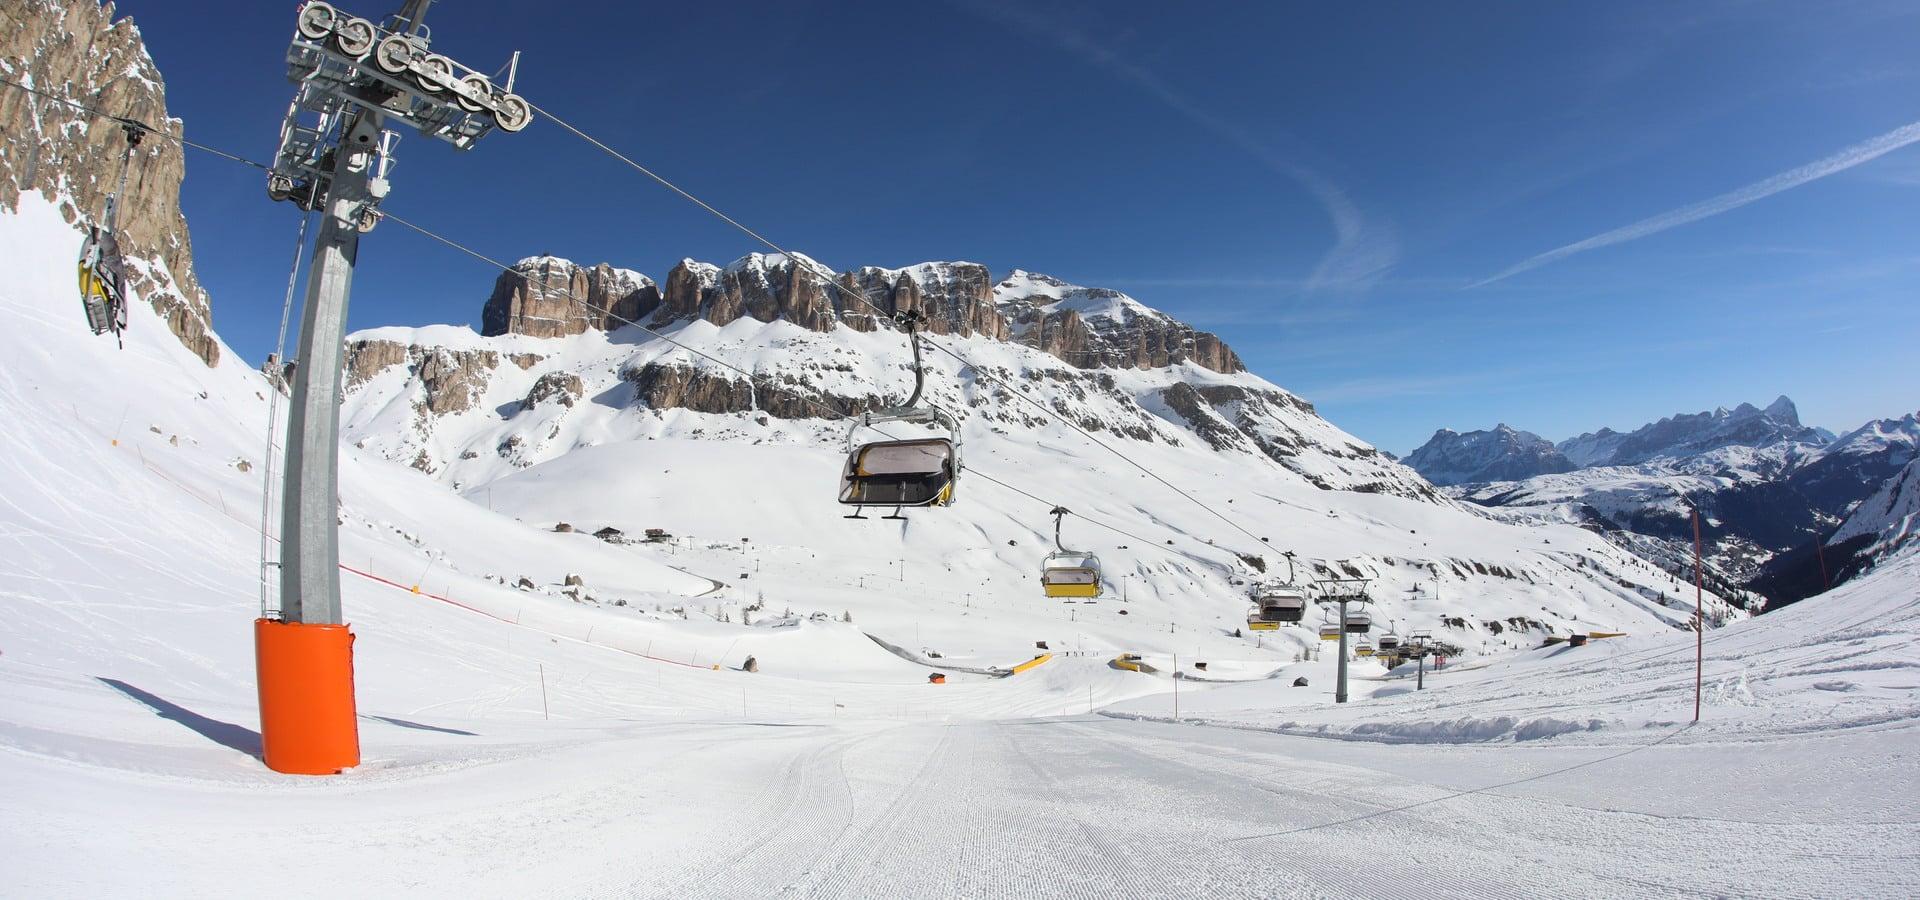 Novità Inverno 2019/2020 Ski Area Arabba - Marmolada